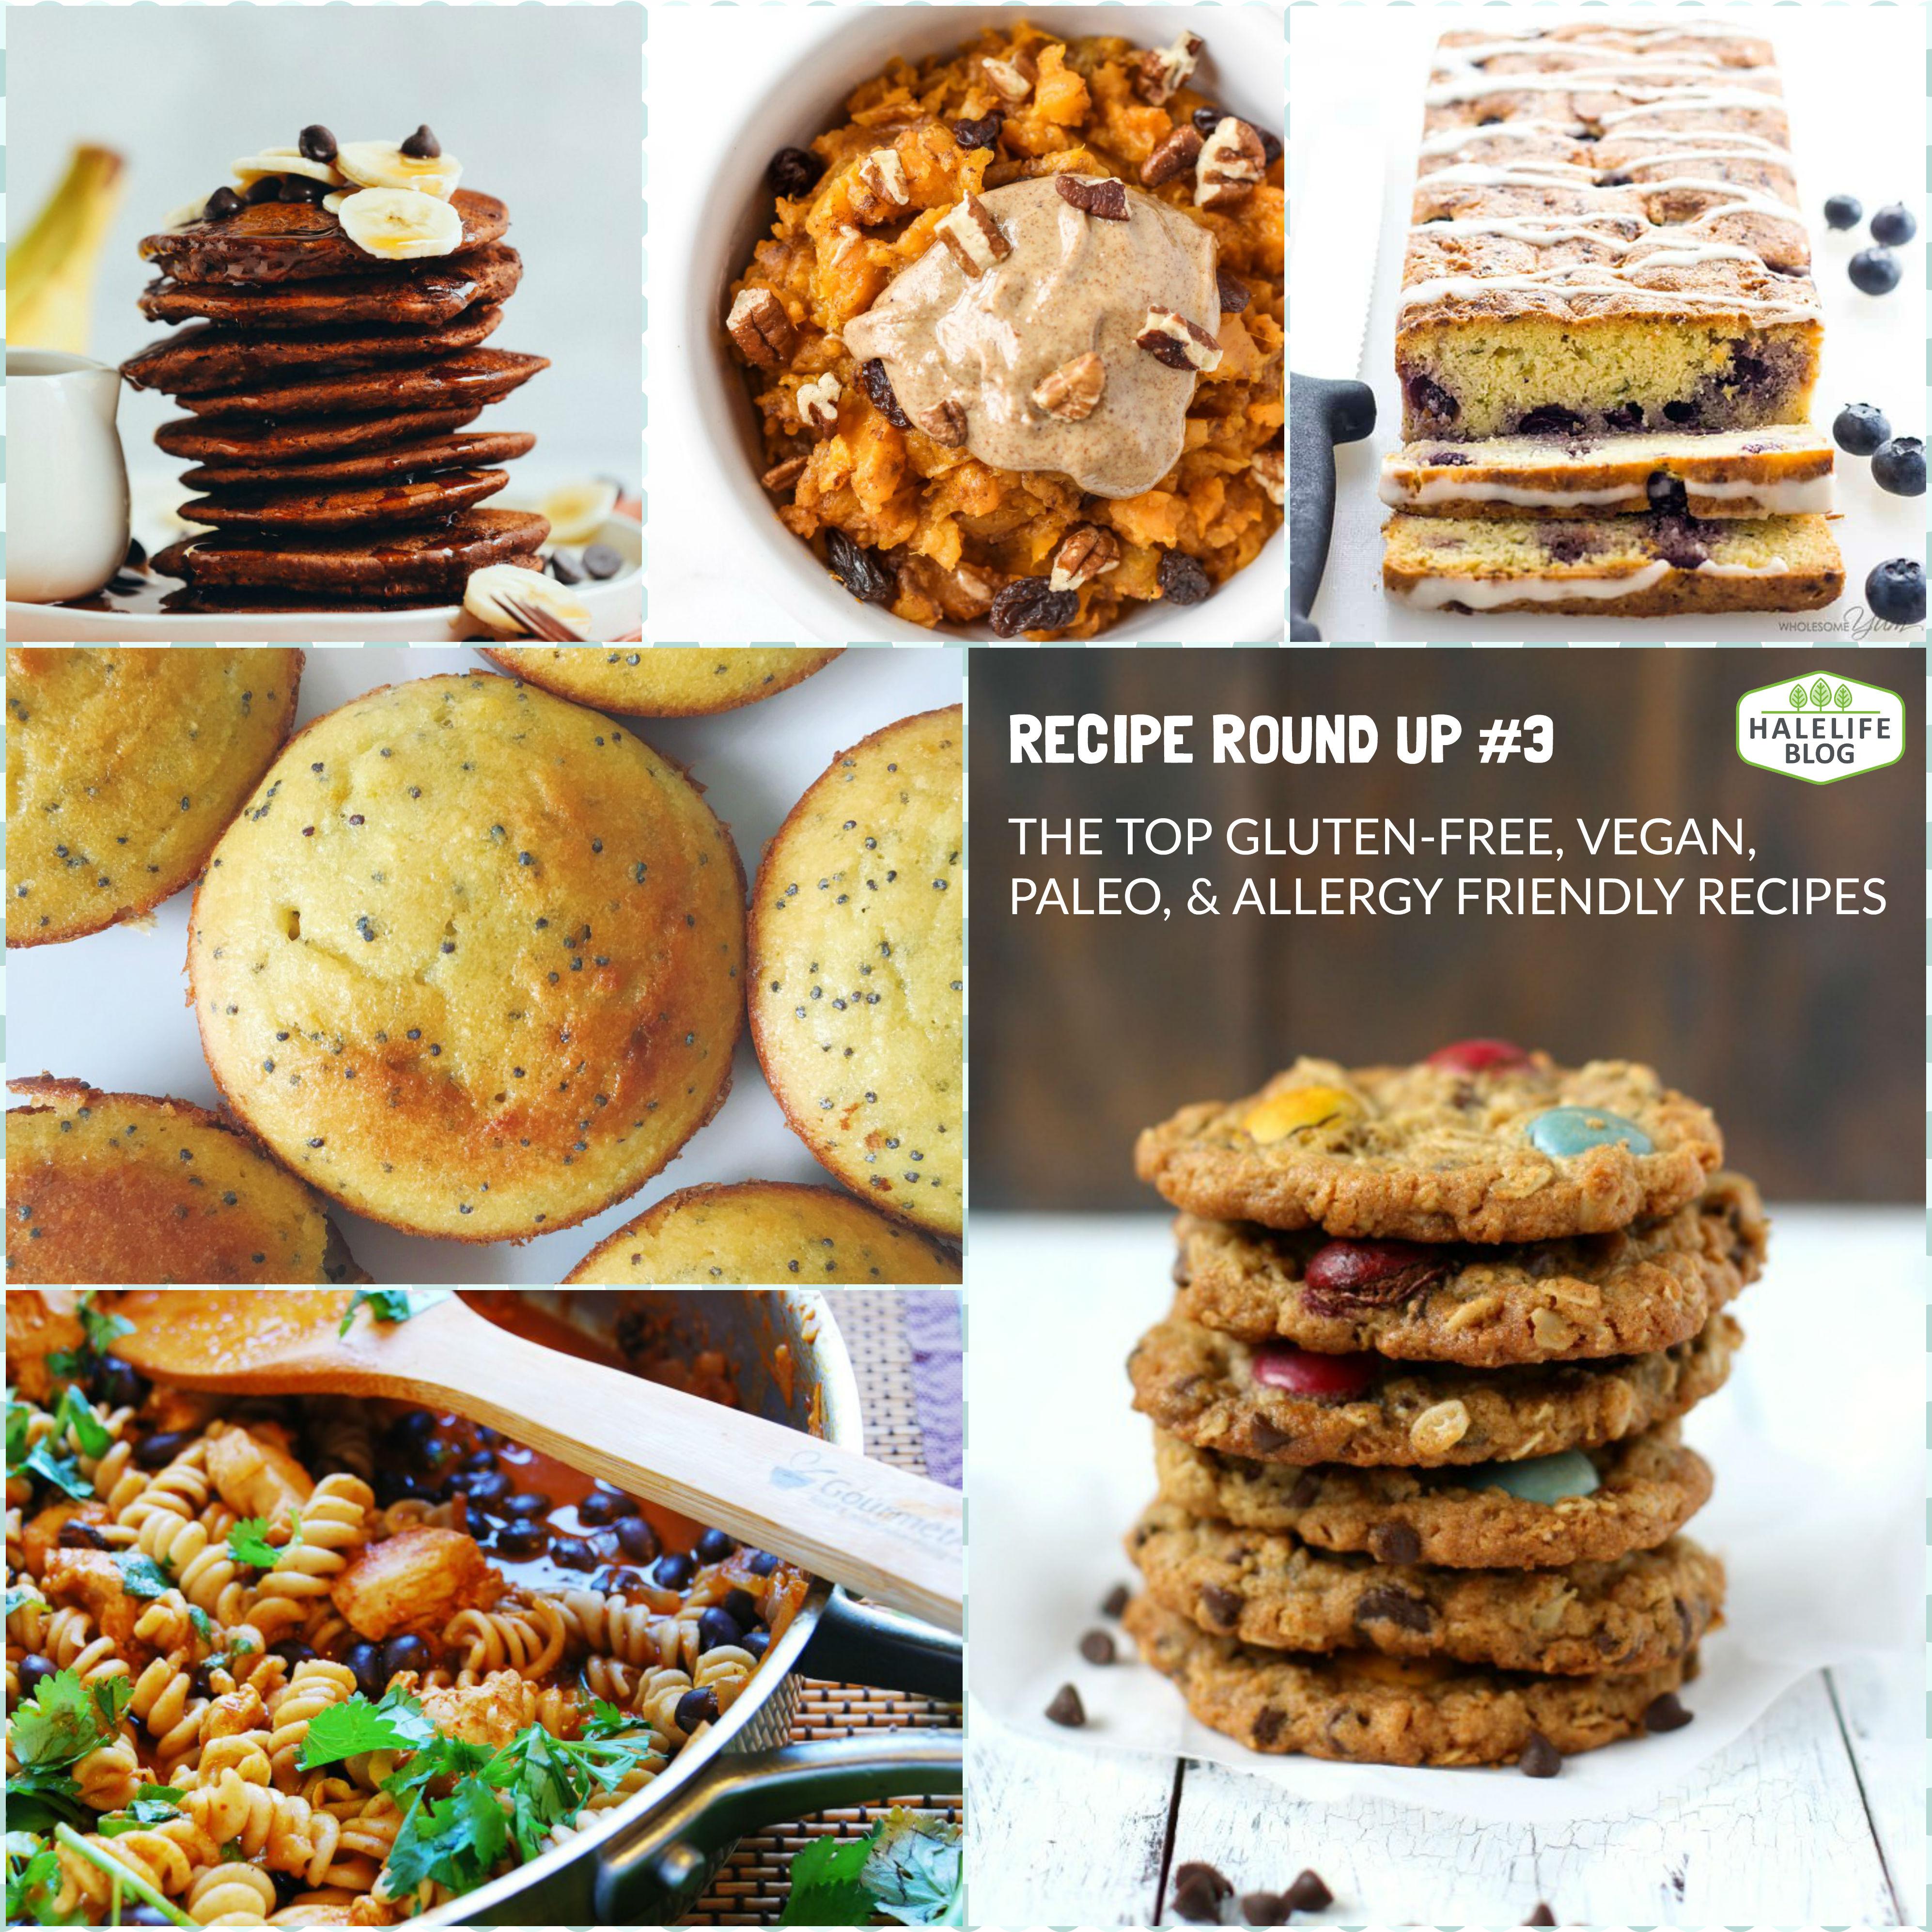 Top recommended recipes 3 gluten free vegan paleo more top recommended recipes 3 gluten free vegan paleo more halelife blog forumfinder Images